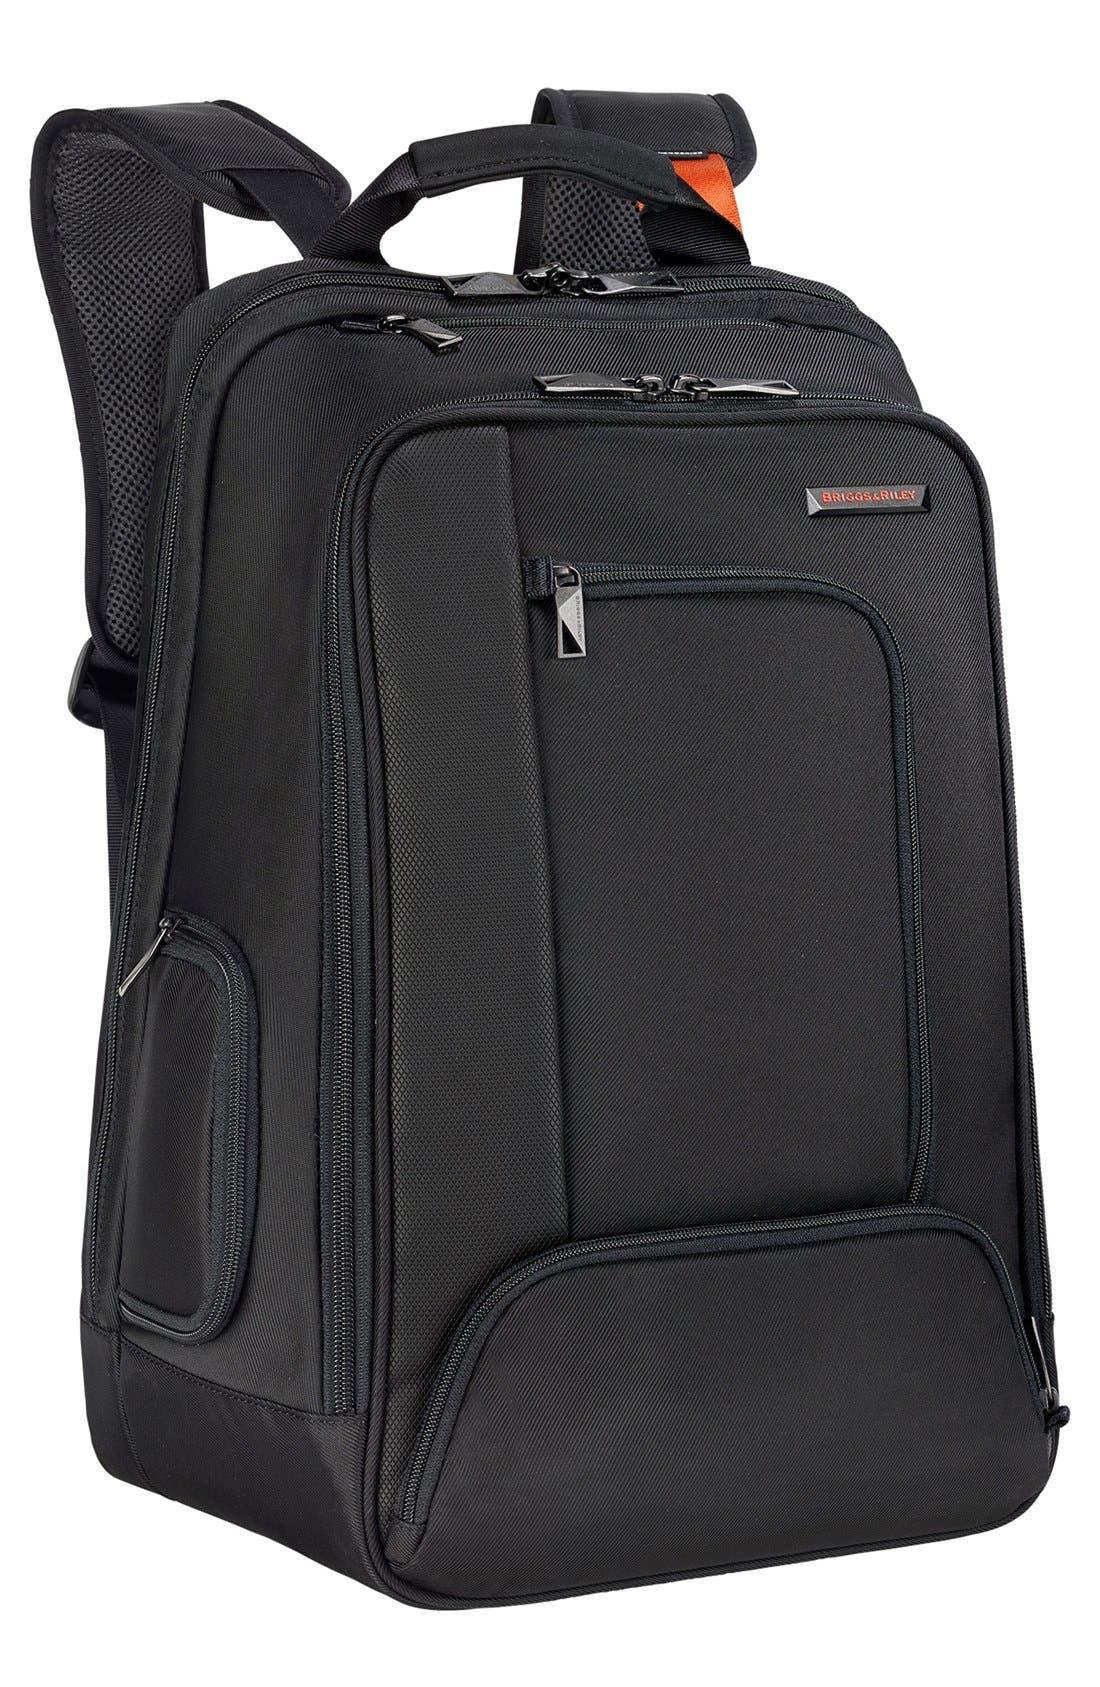 BRIGGS & RILEY Verb - Accelerate Backpack